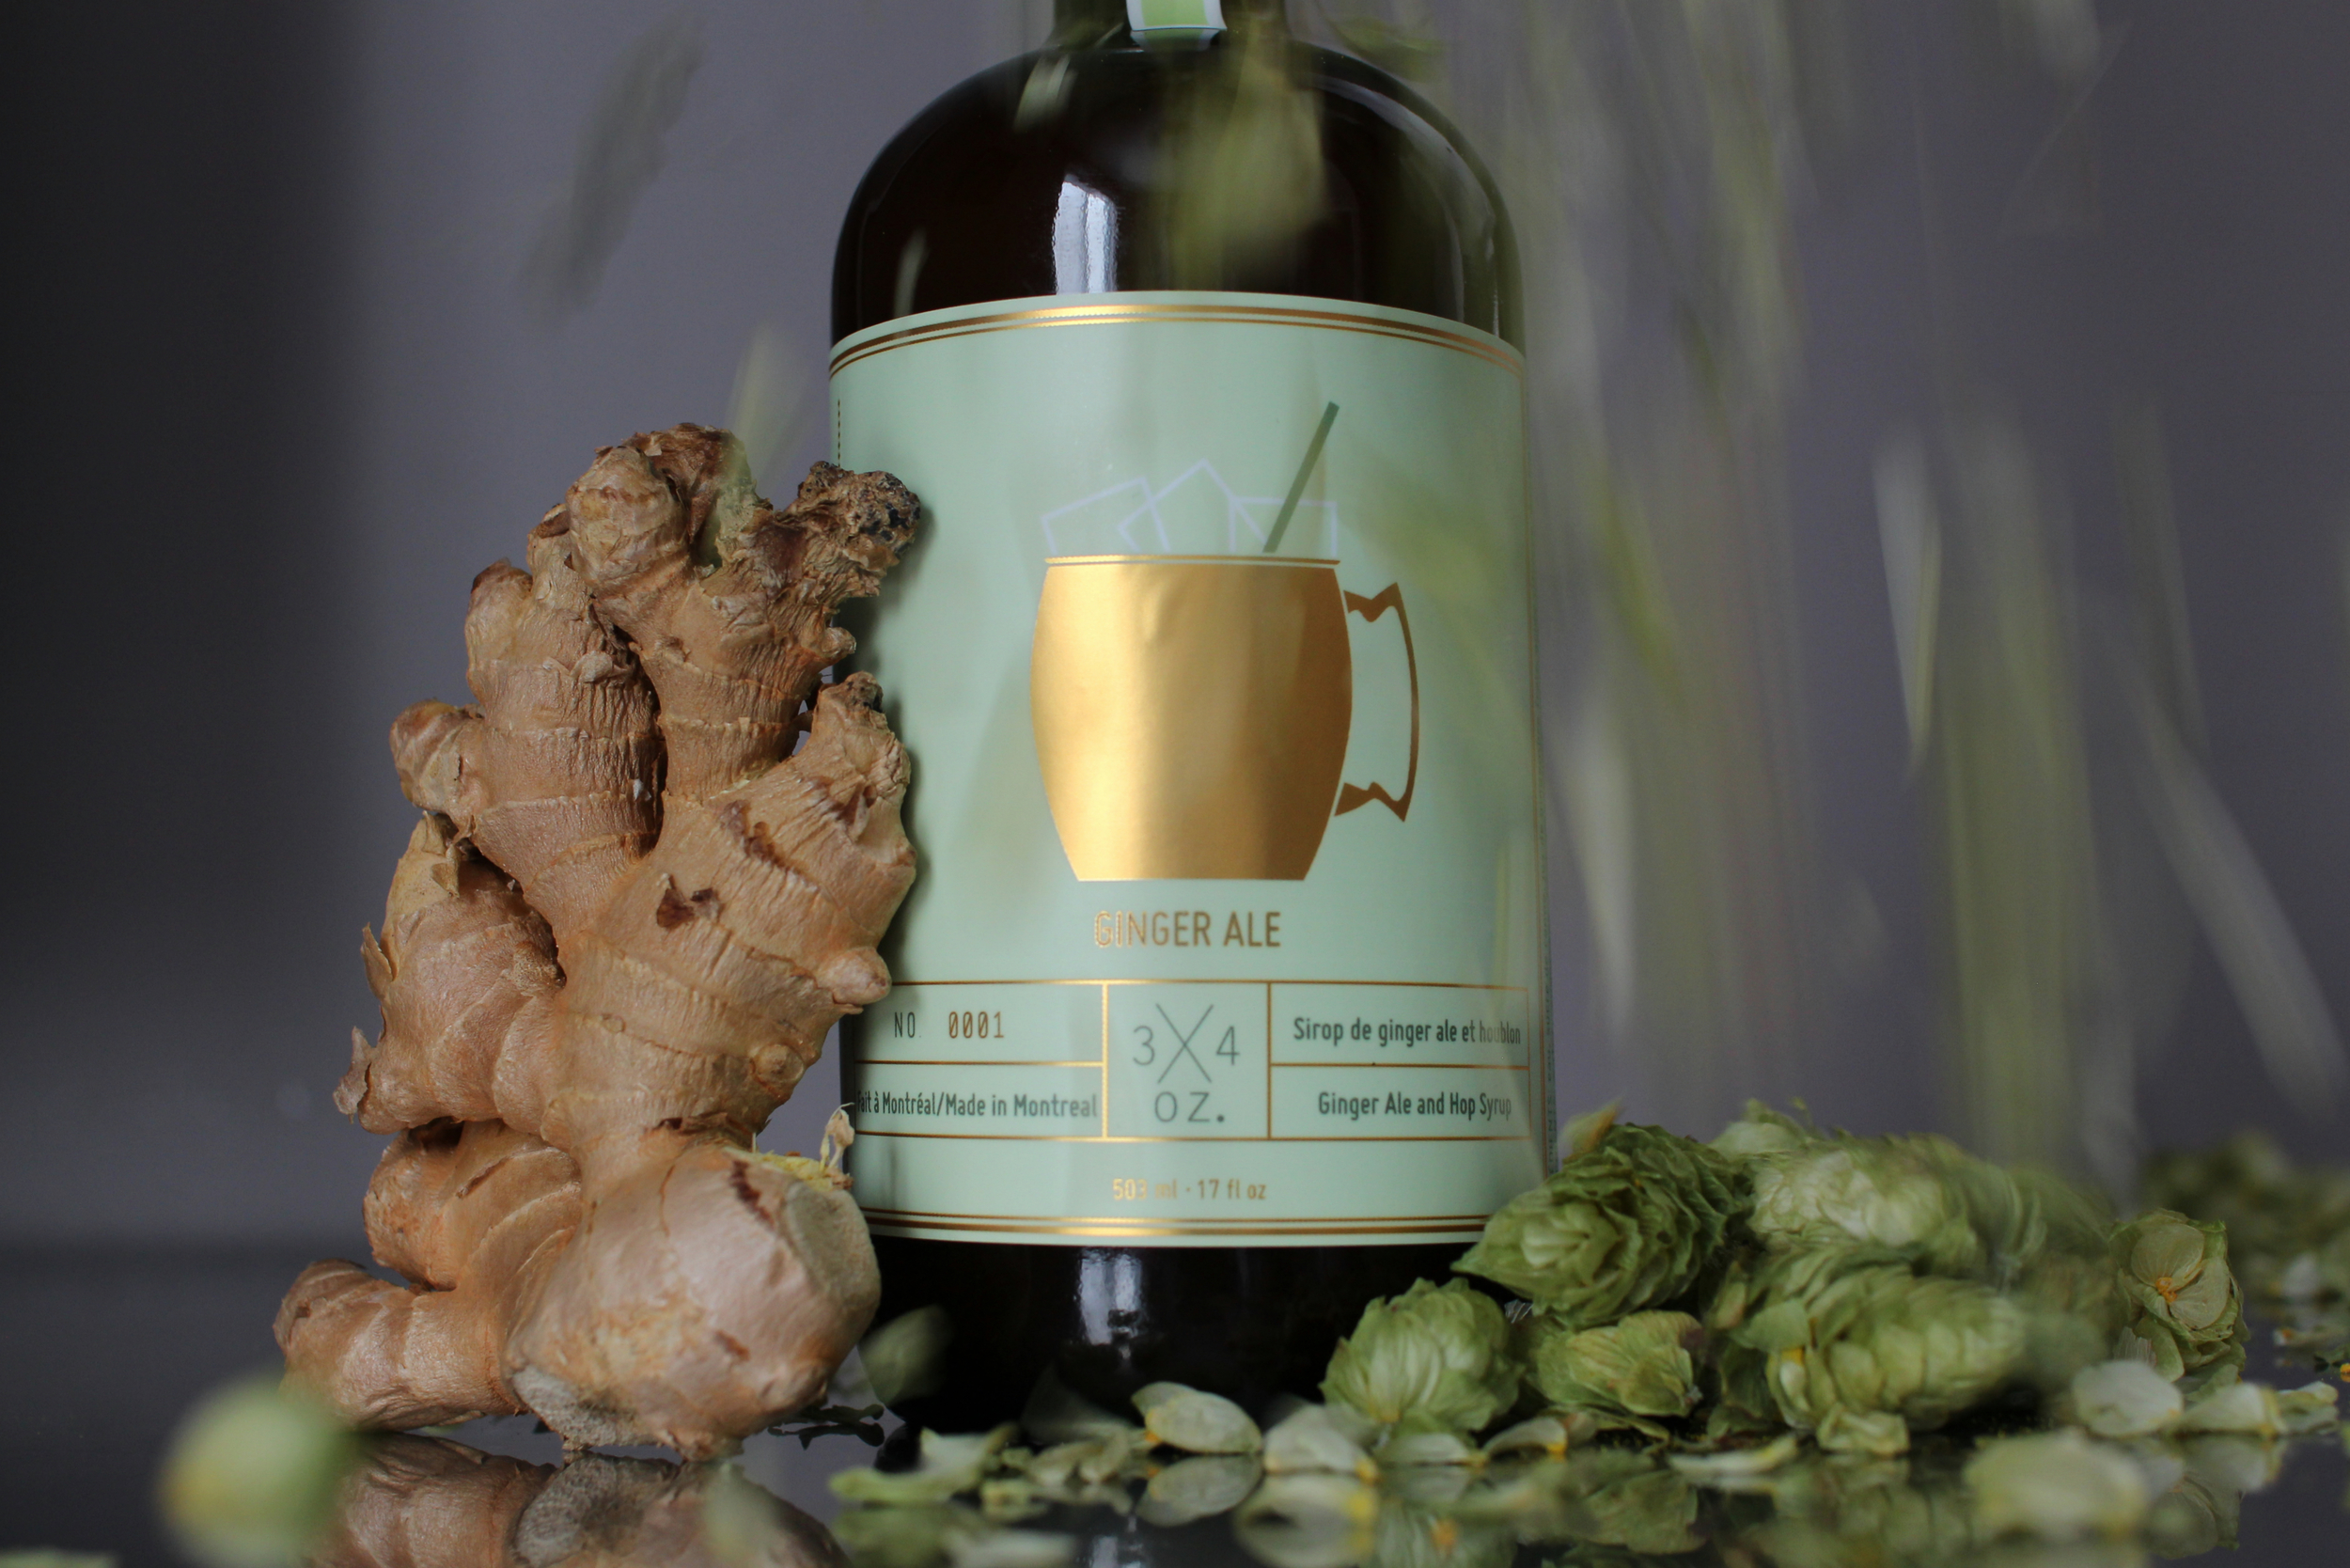 Sirop ginger ale houblon 3/4 oz